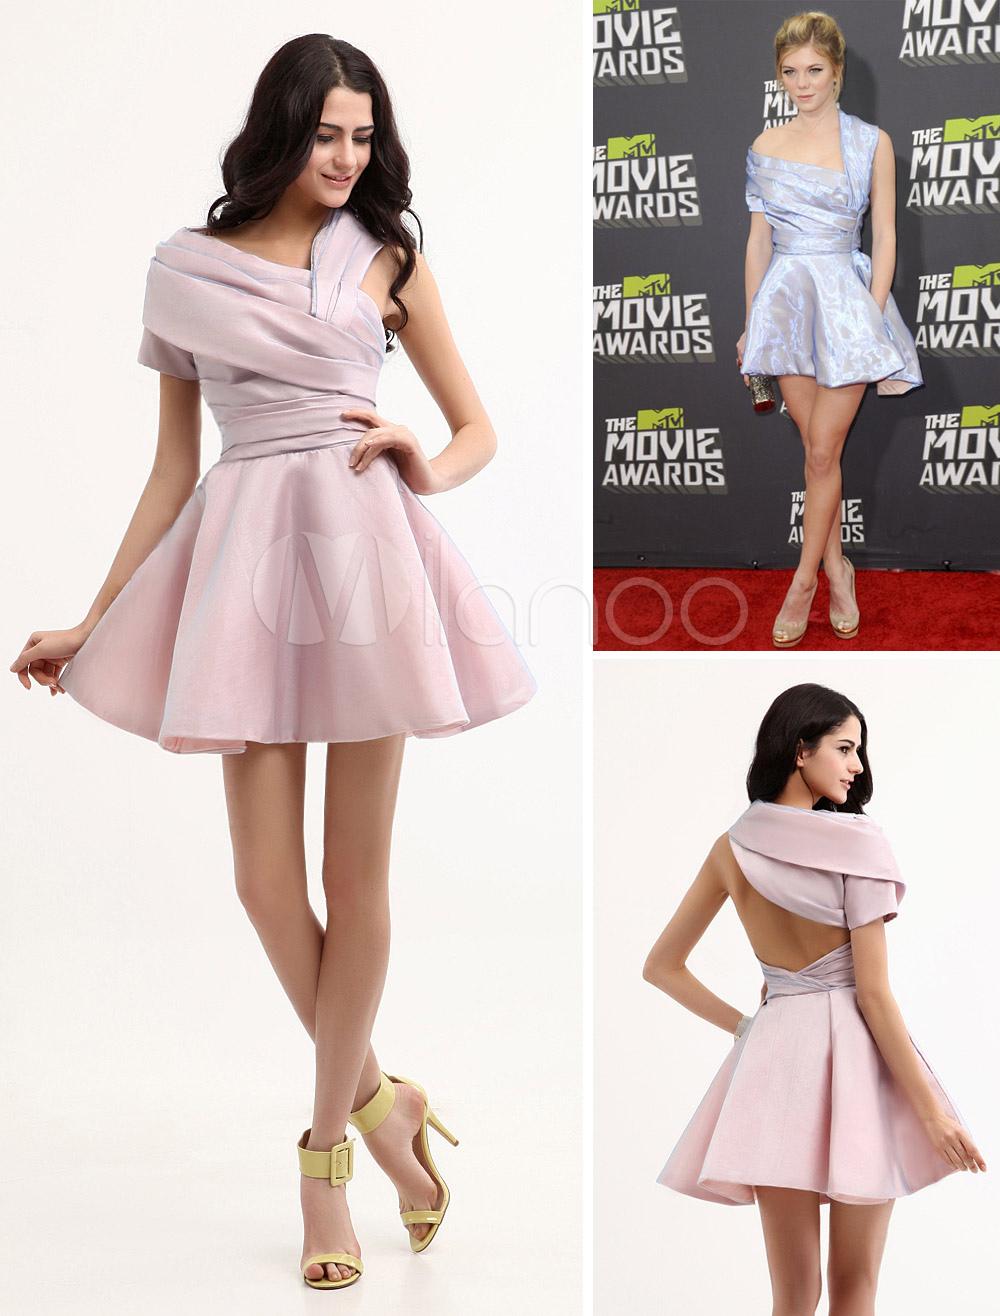 Chic A-line Pewter Taffeta One-Shoulder Short Cocktail Dress